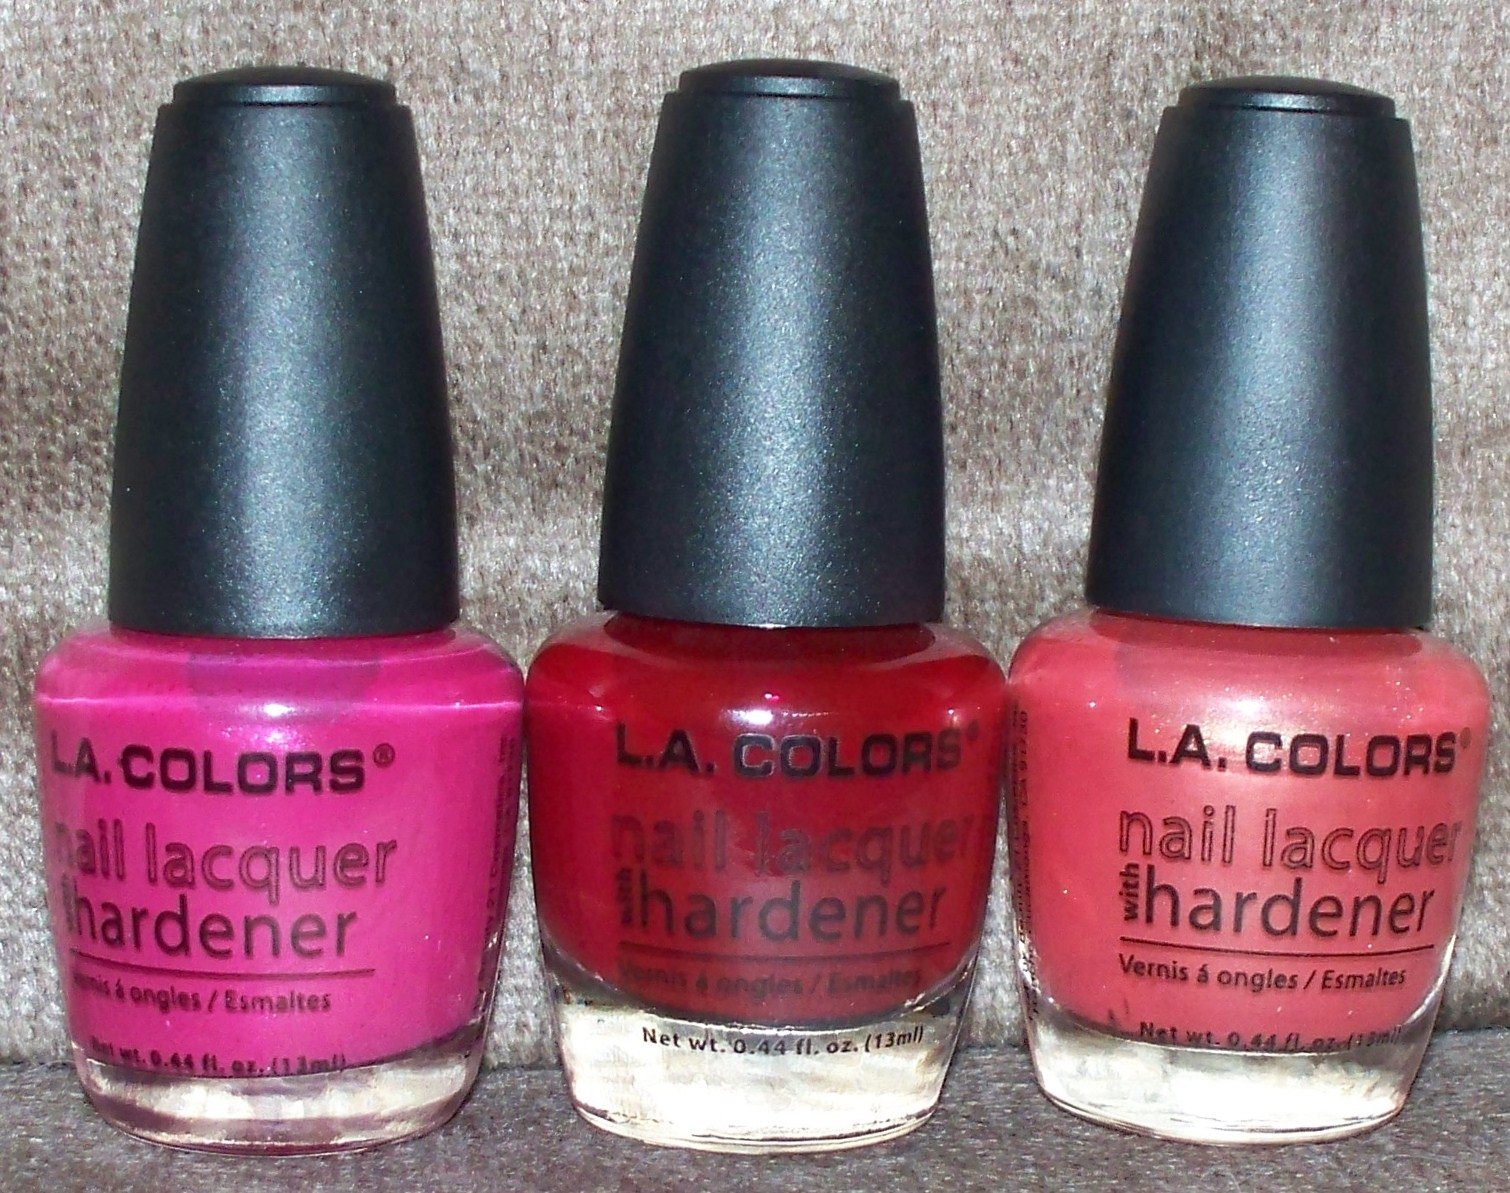 La Colors Nail Hardener | Best Nail Designs 2018